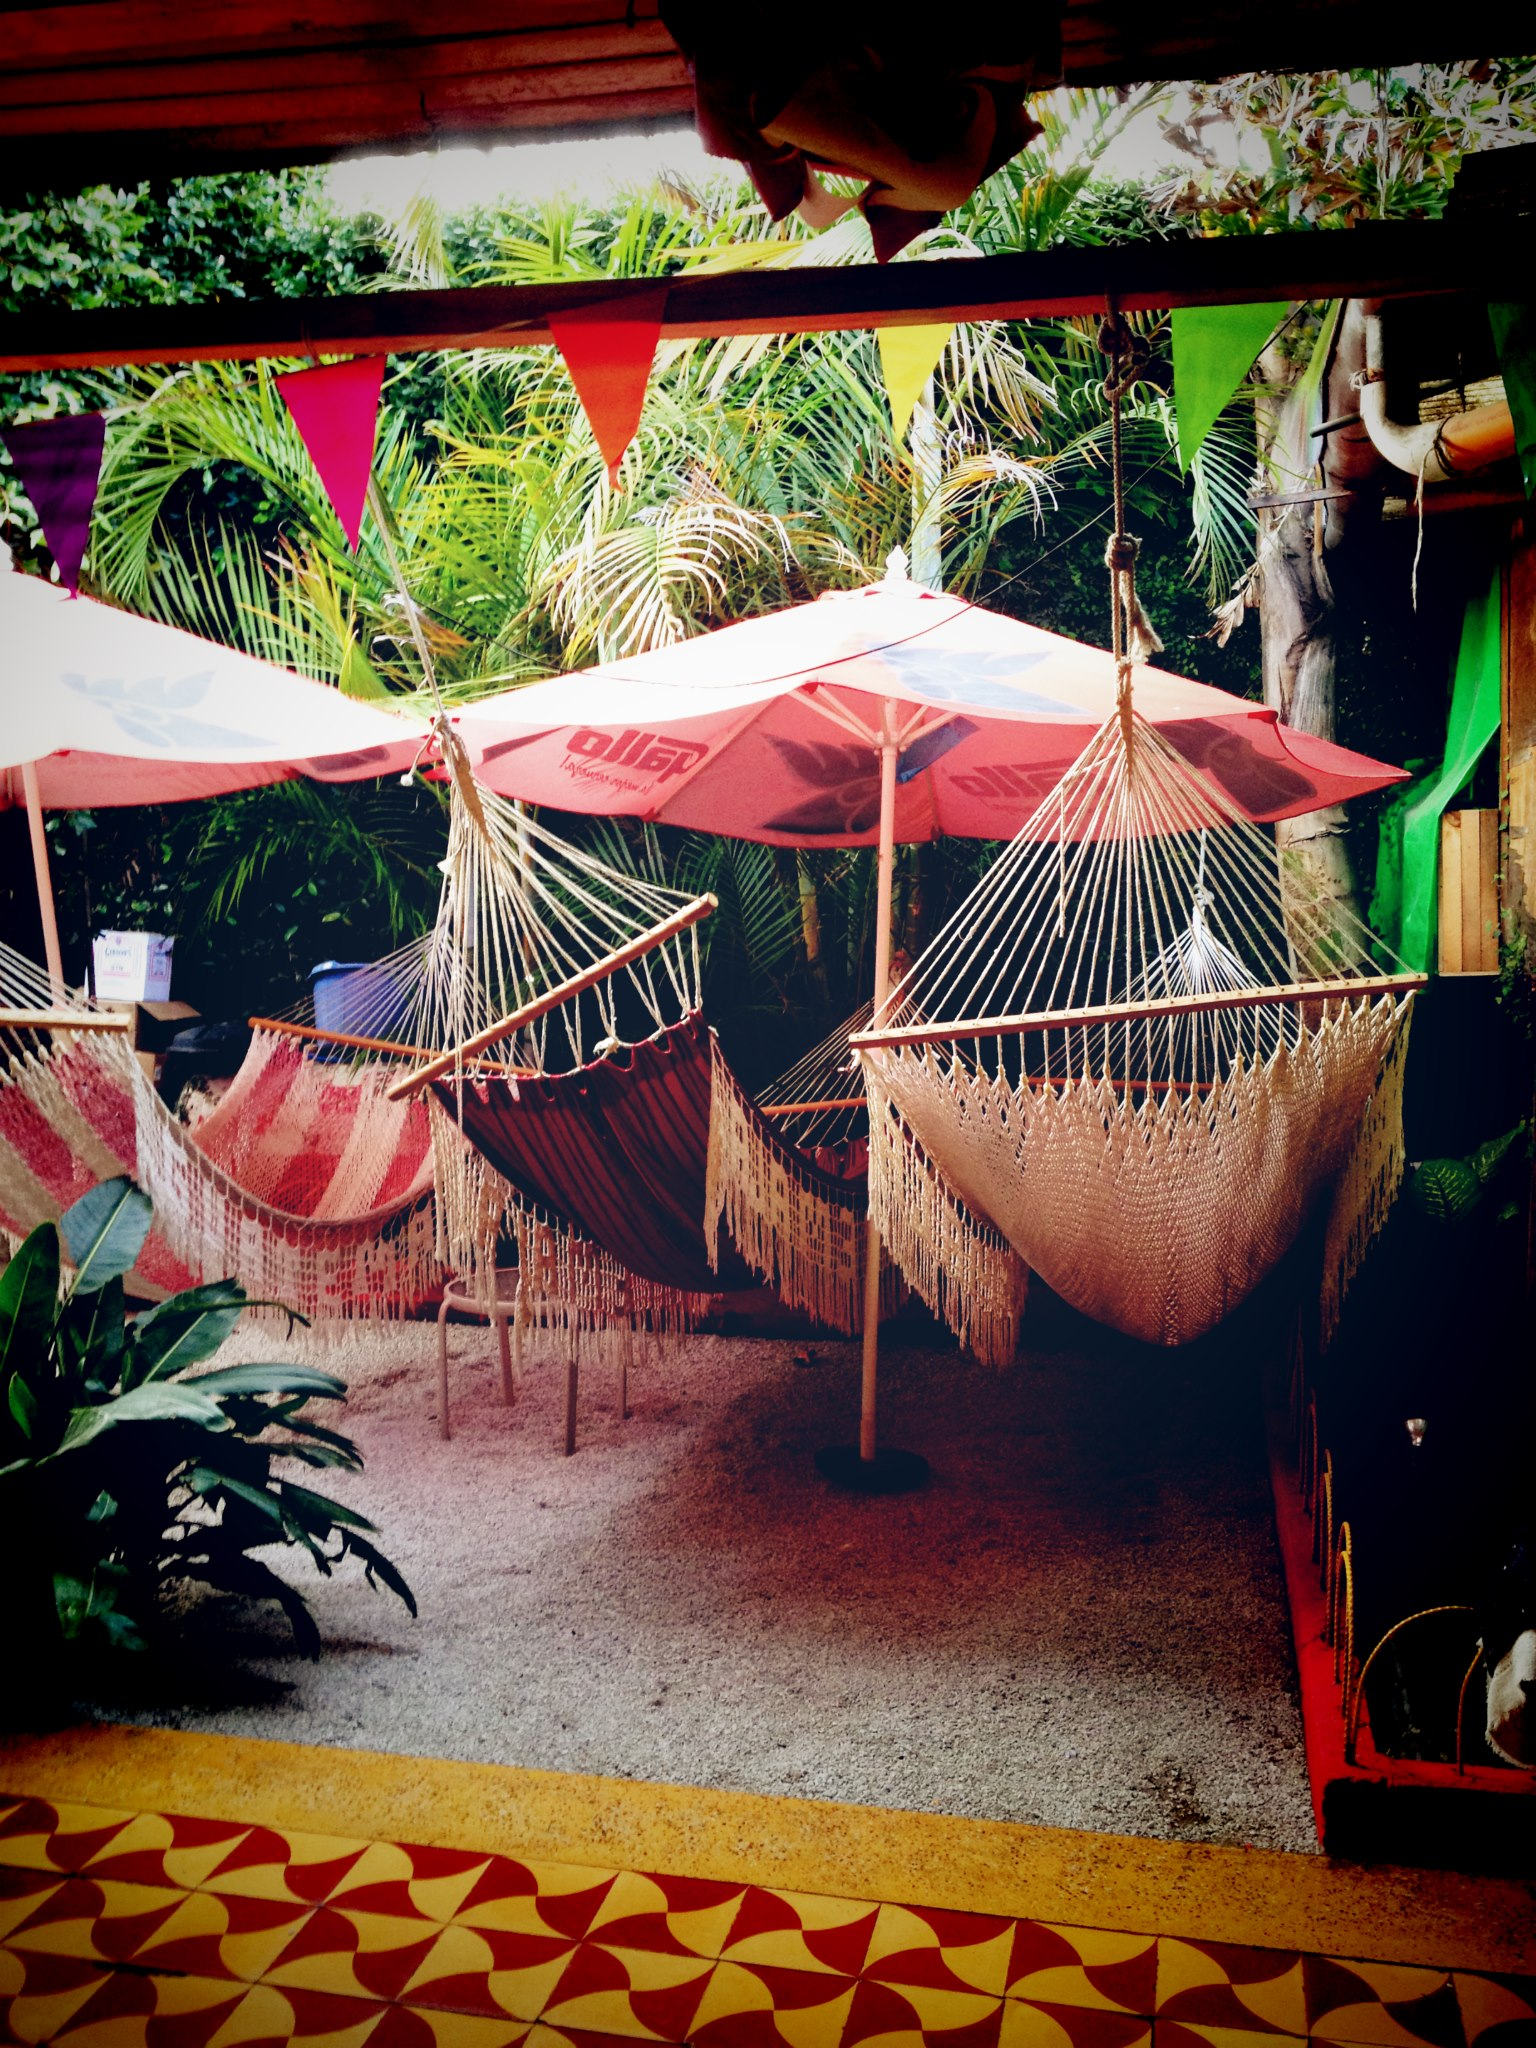 guatemala tubing travel guide